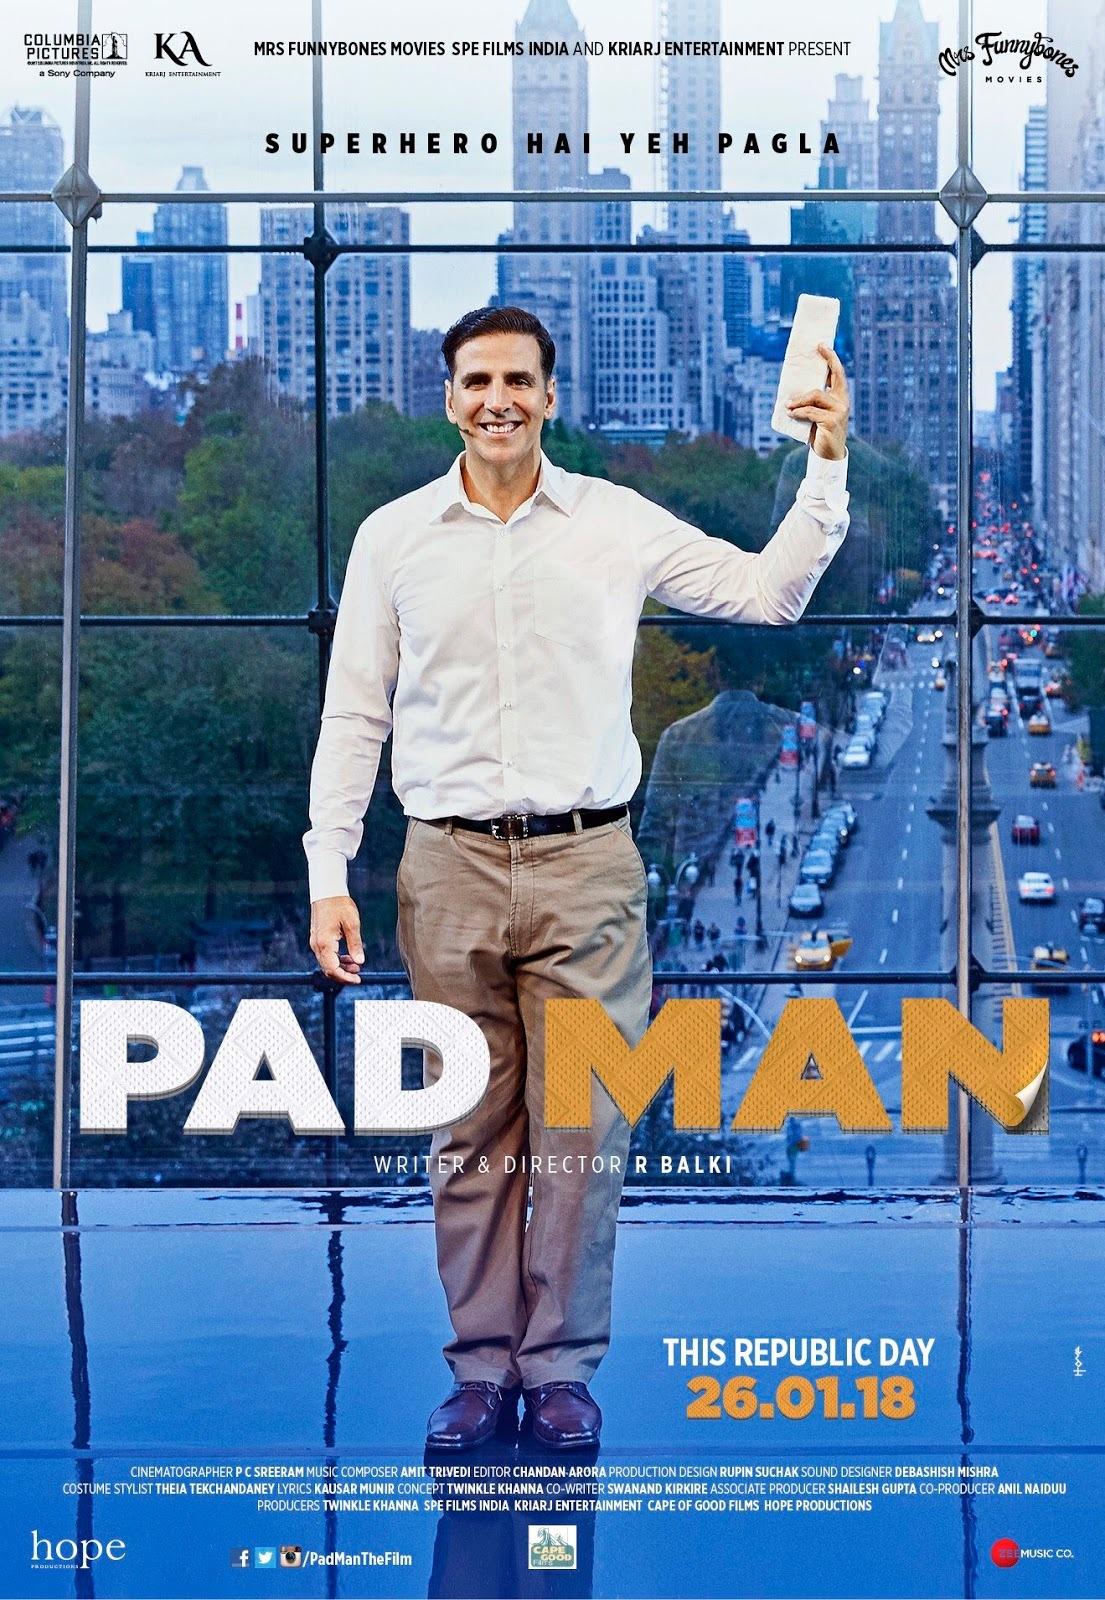 PAD MAN: SUPERHERO INDIA DI BALIK PEMBALUT